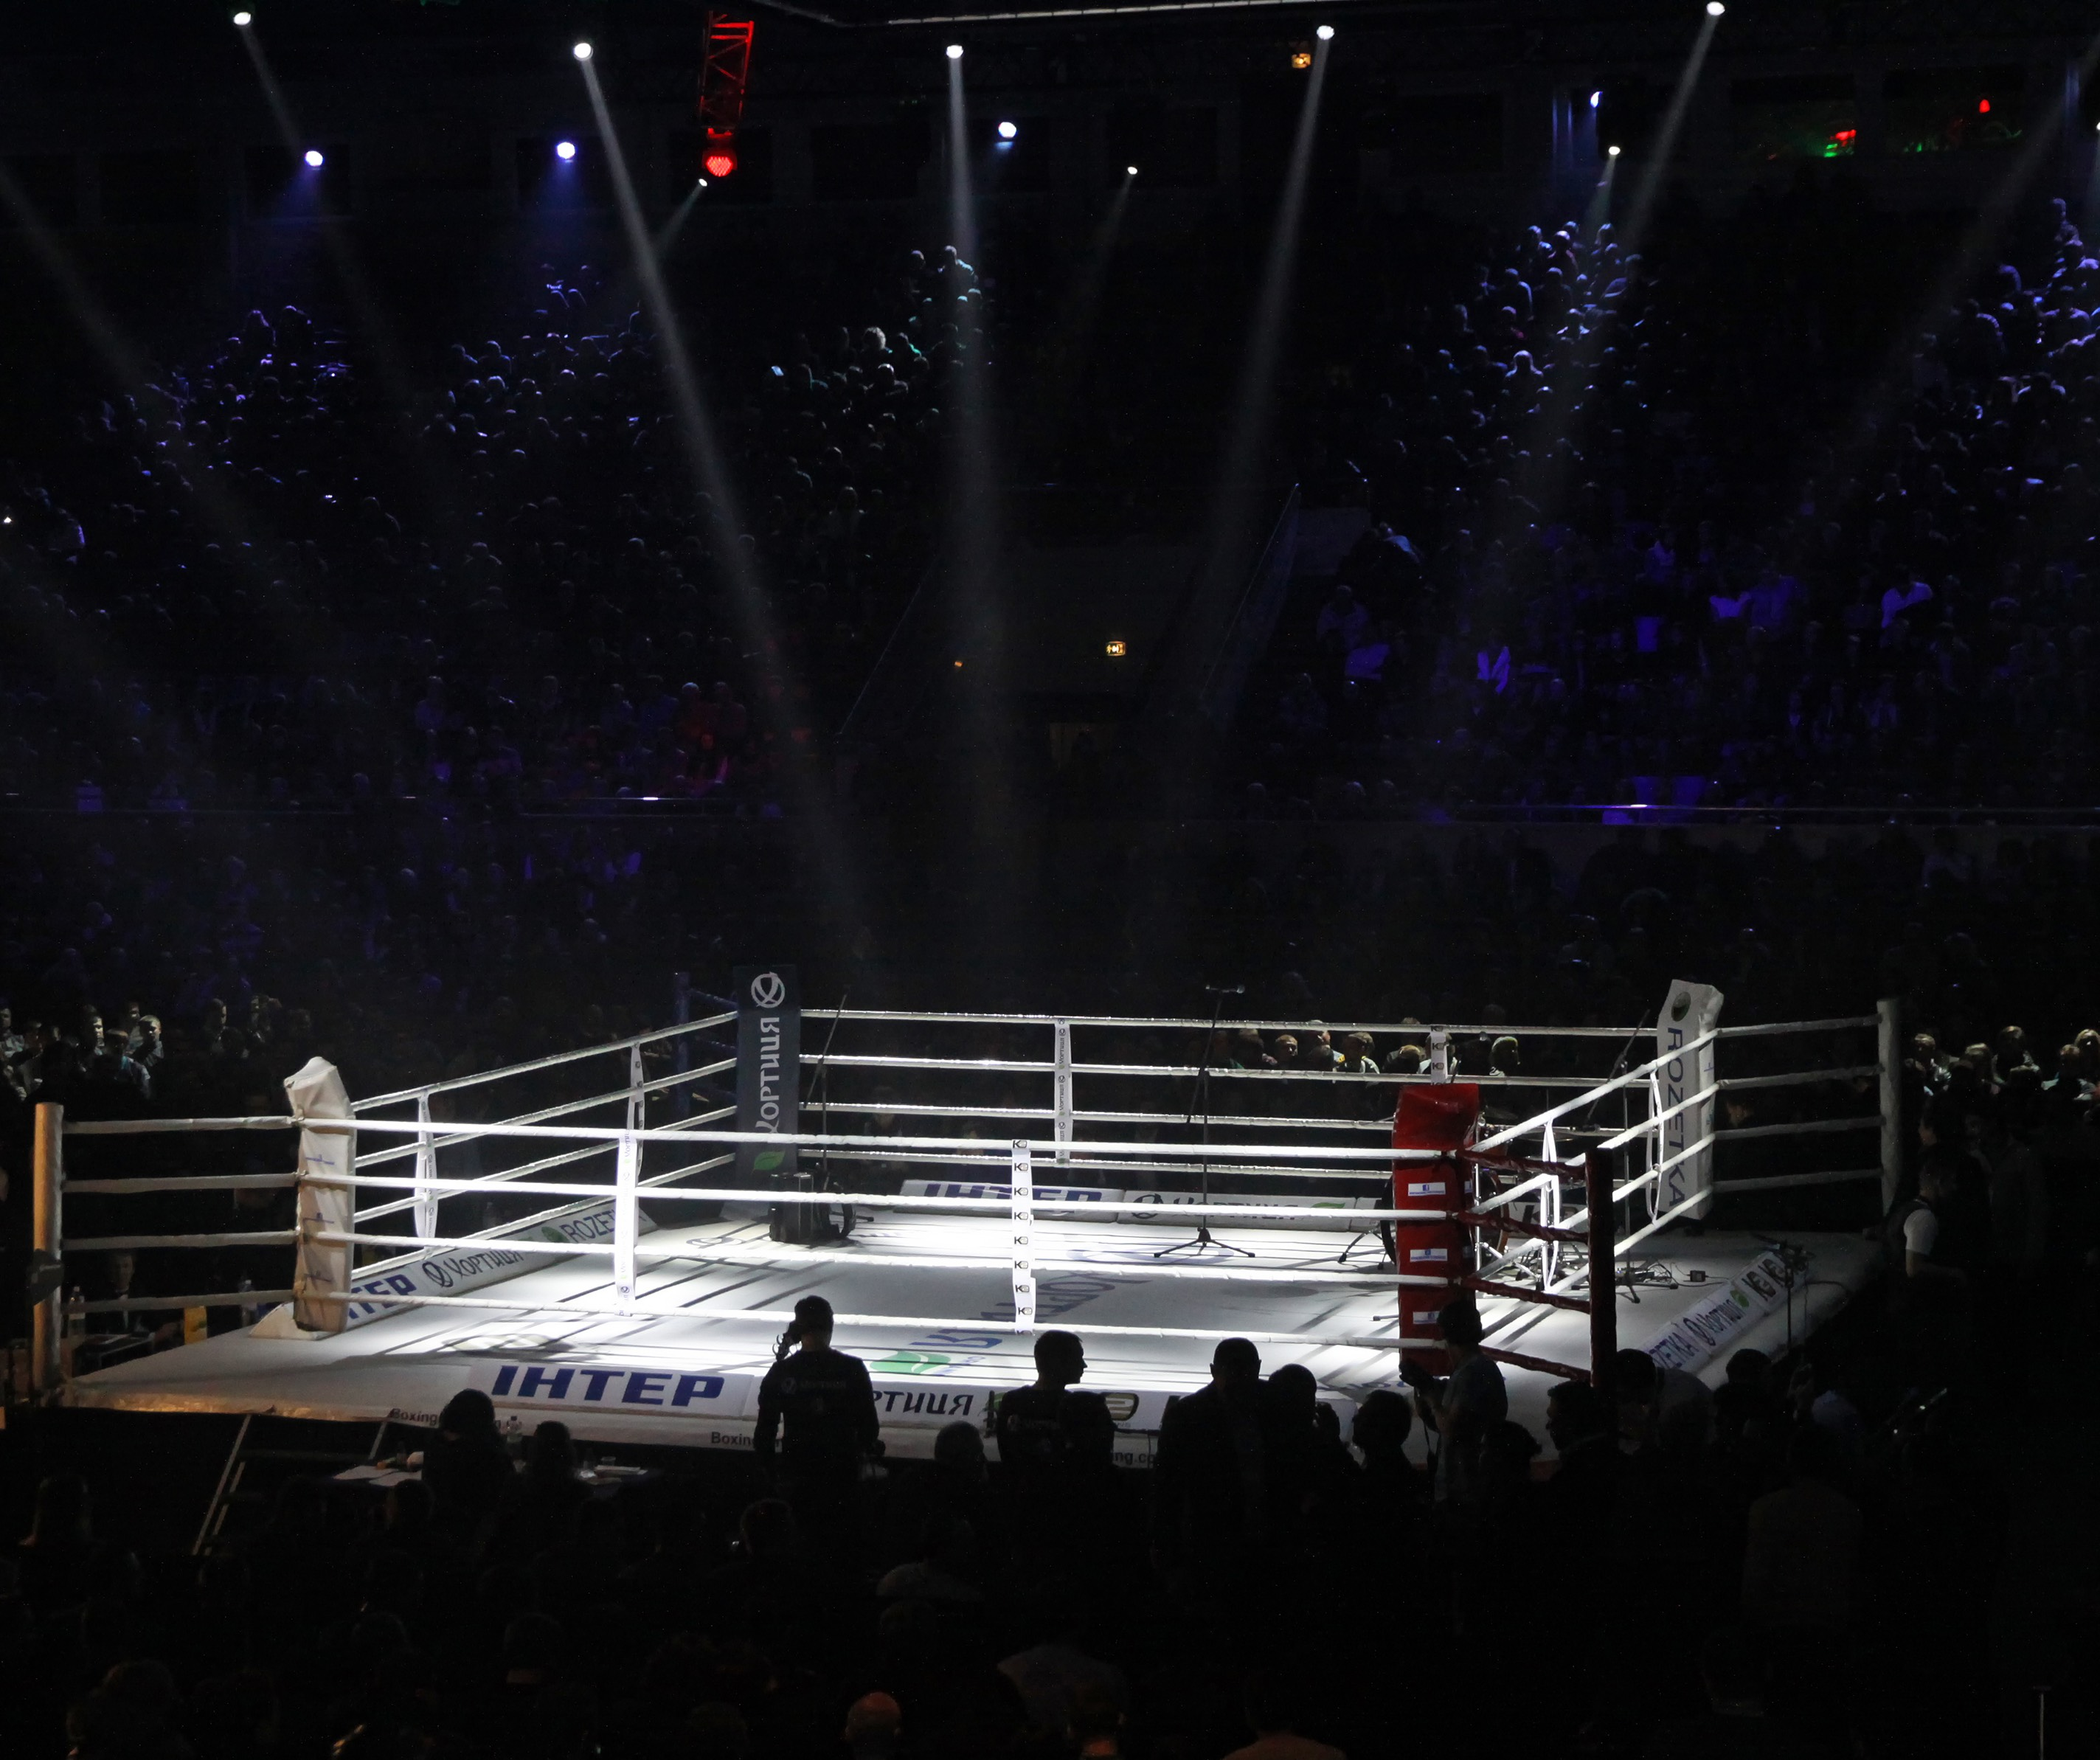 My Top 3 Dream Heavyweight Boxing Matchups